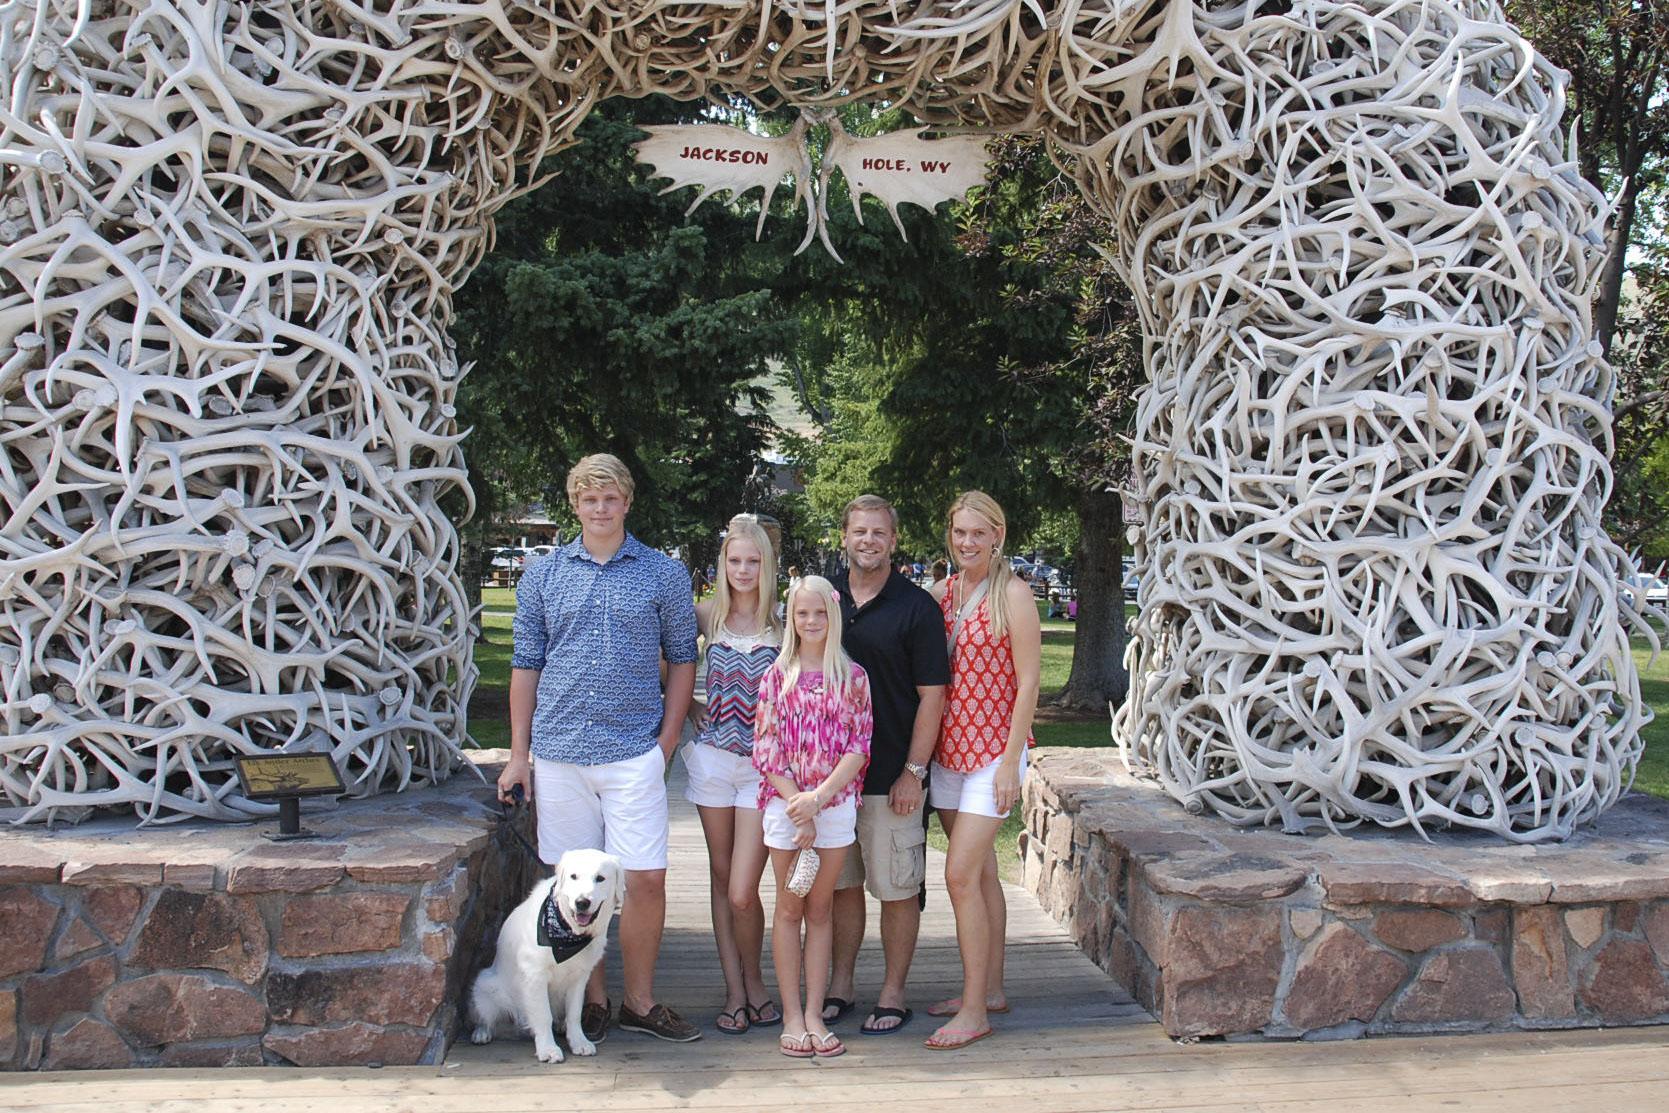 Jackson Hole Park - antlers-a